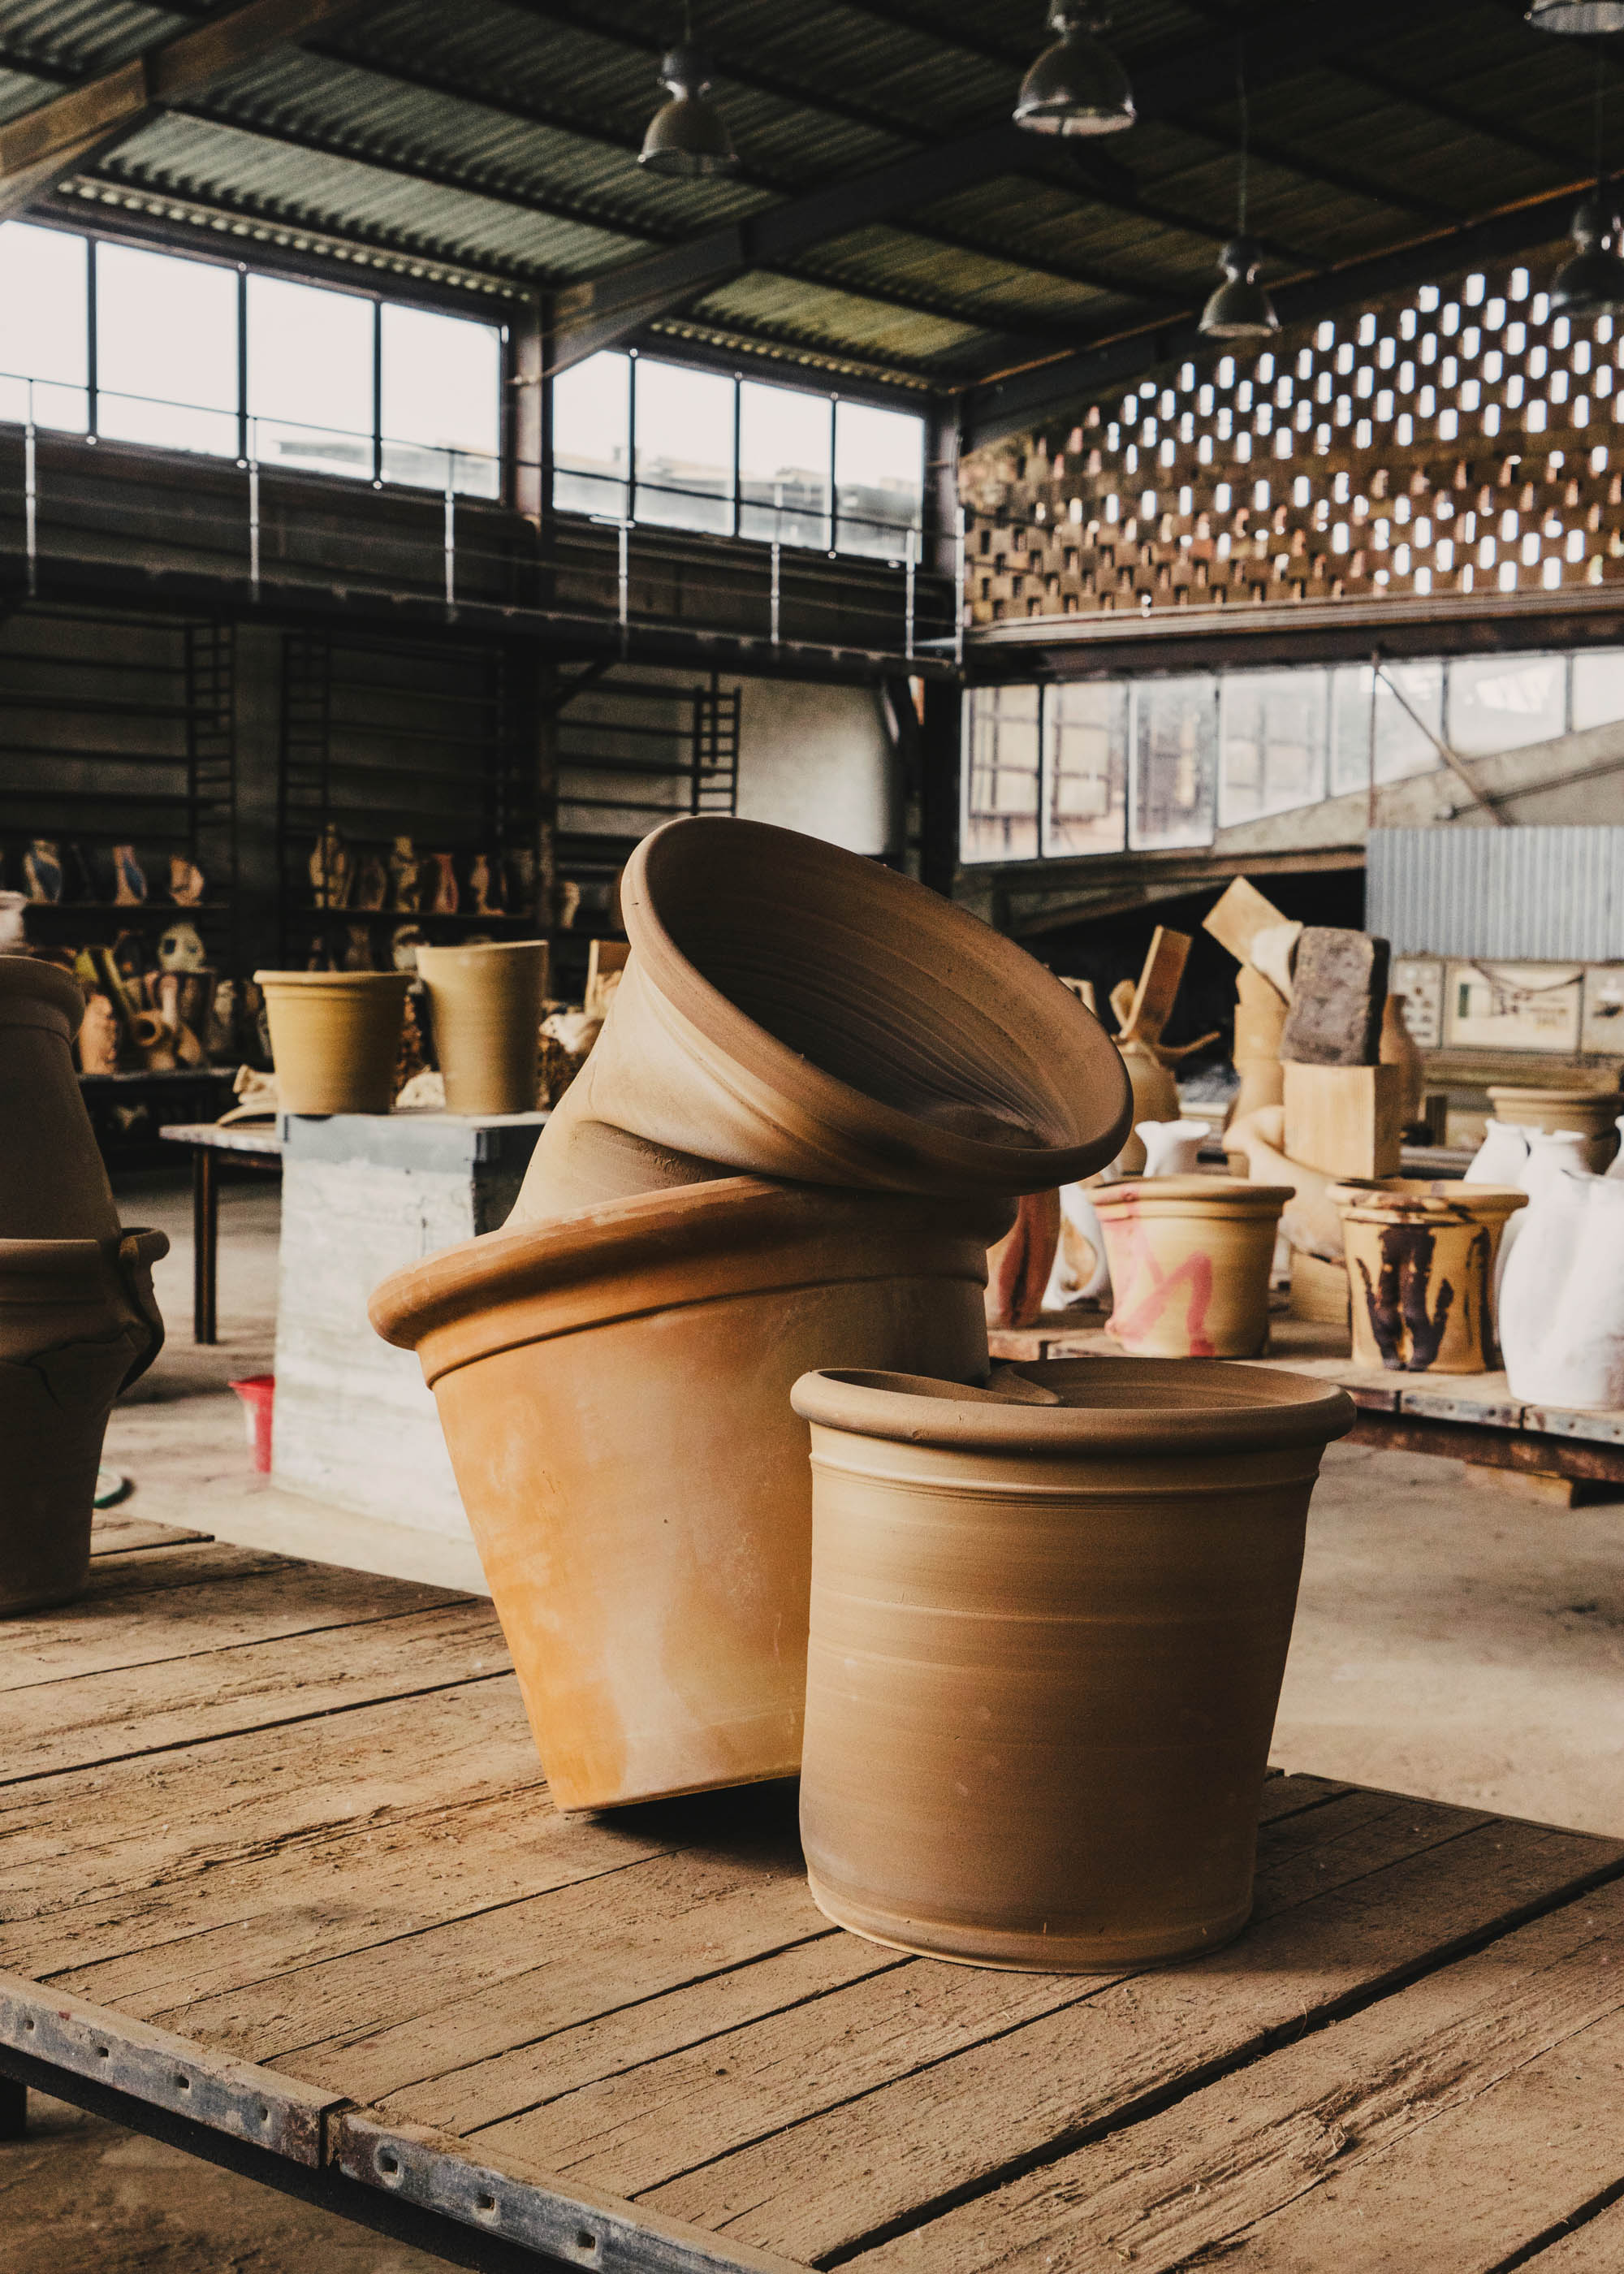 #miquel #barcelo #artist #studio #ceramics #mallorca #editorial #wsj #wallstreetjournal